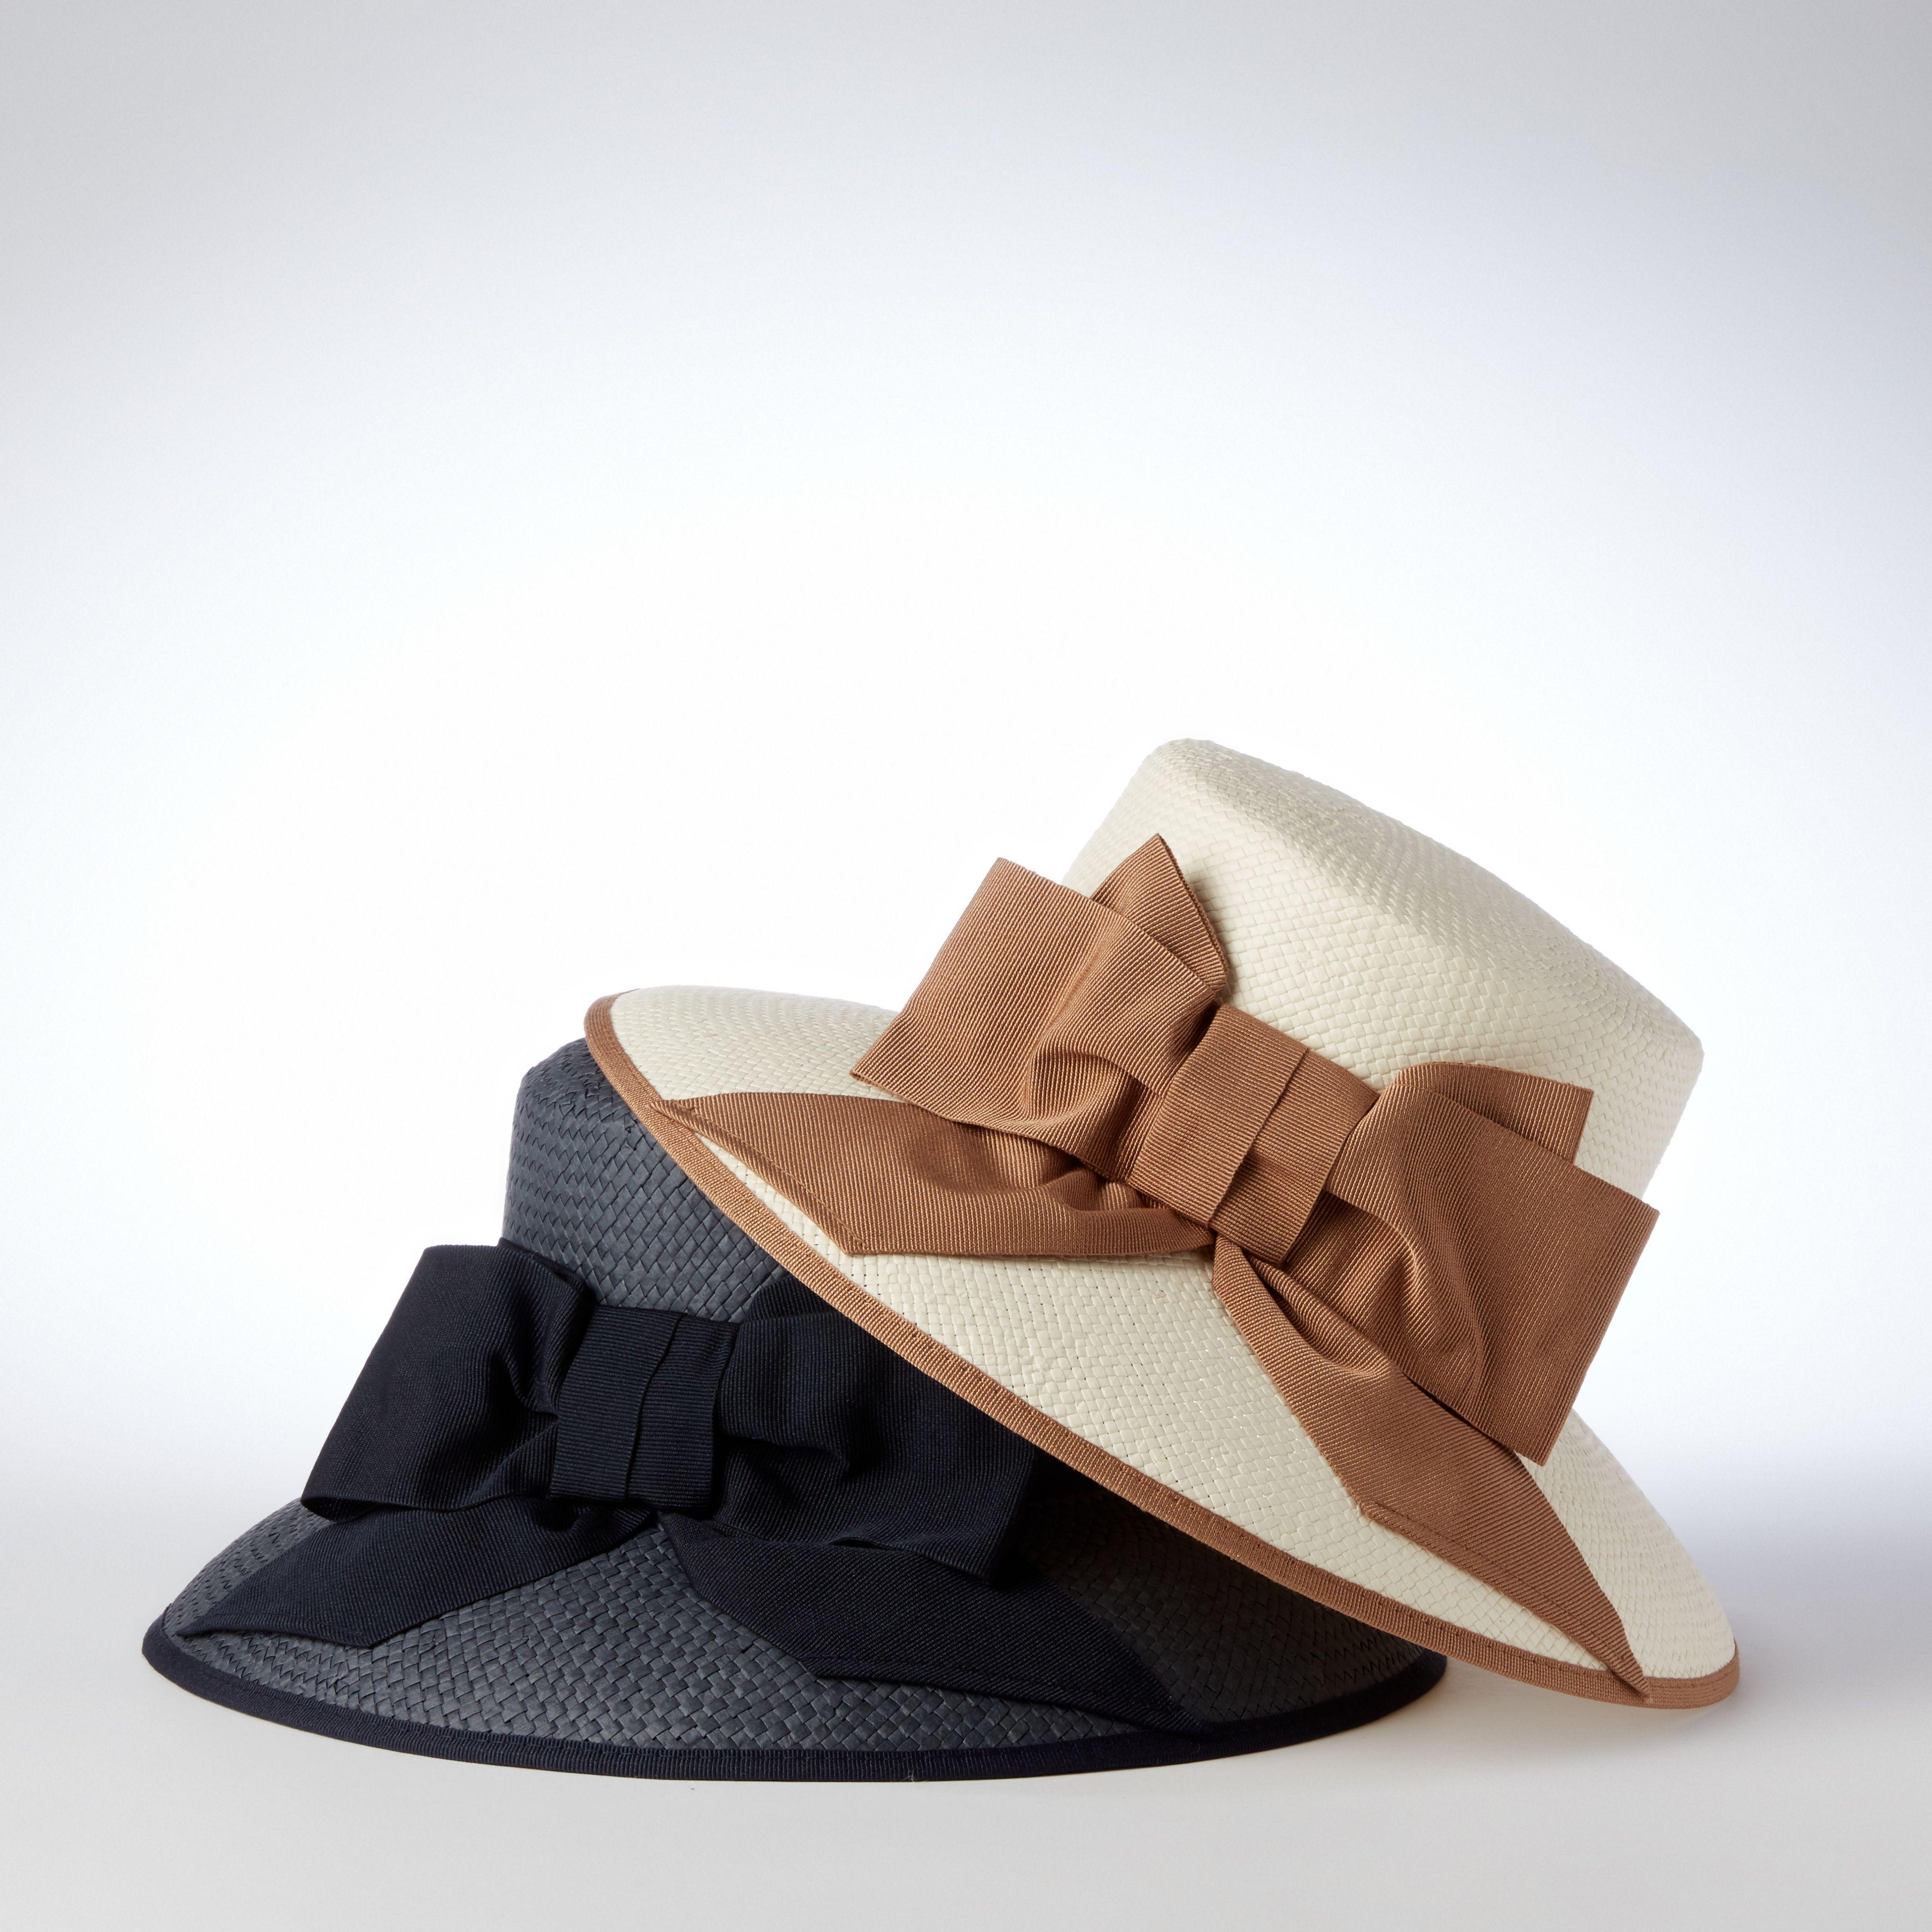 Helene Berman Bow detail Audrey hat